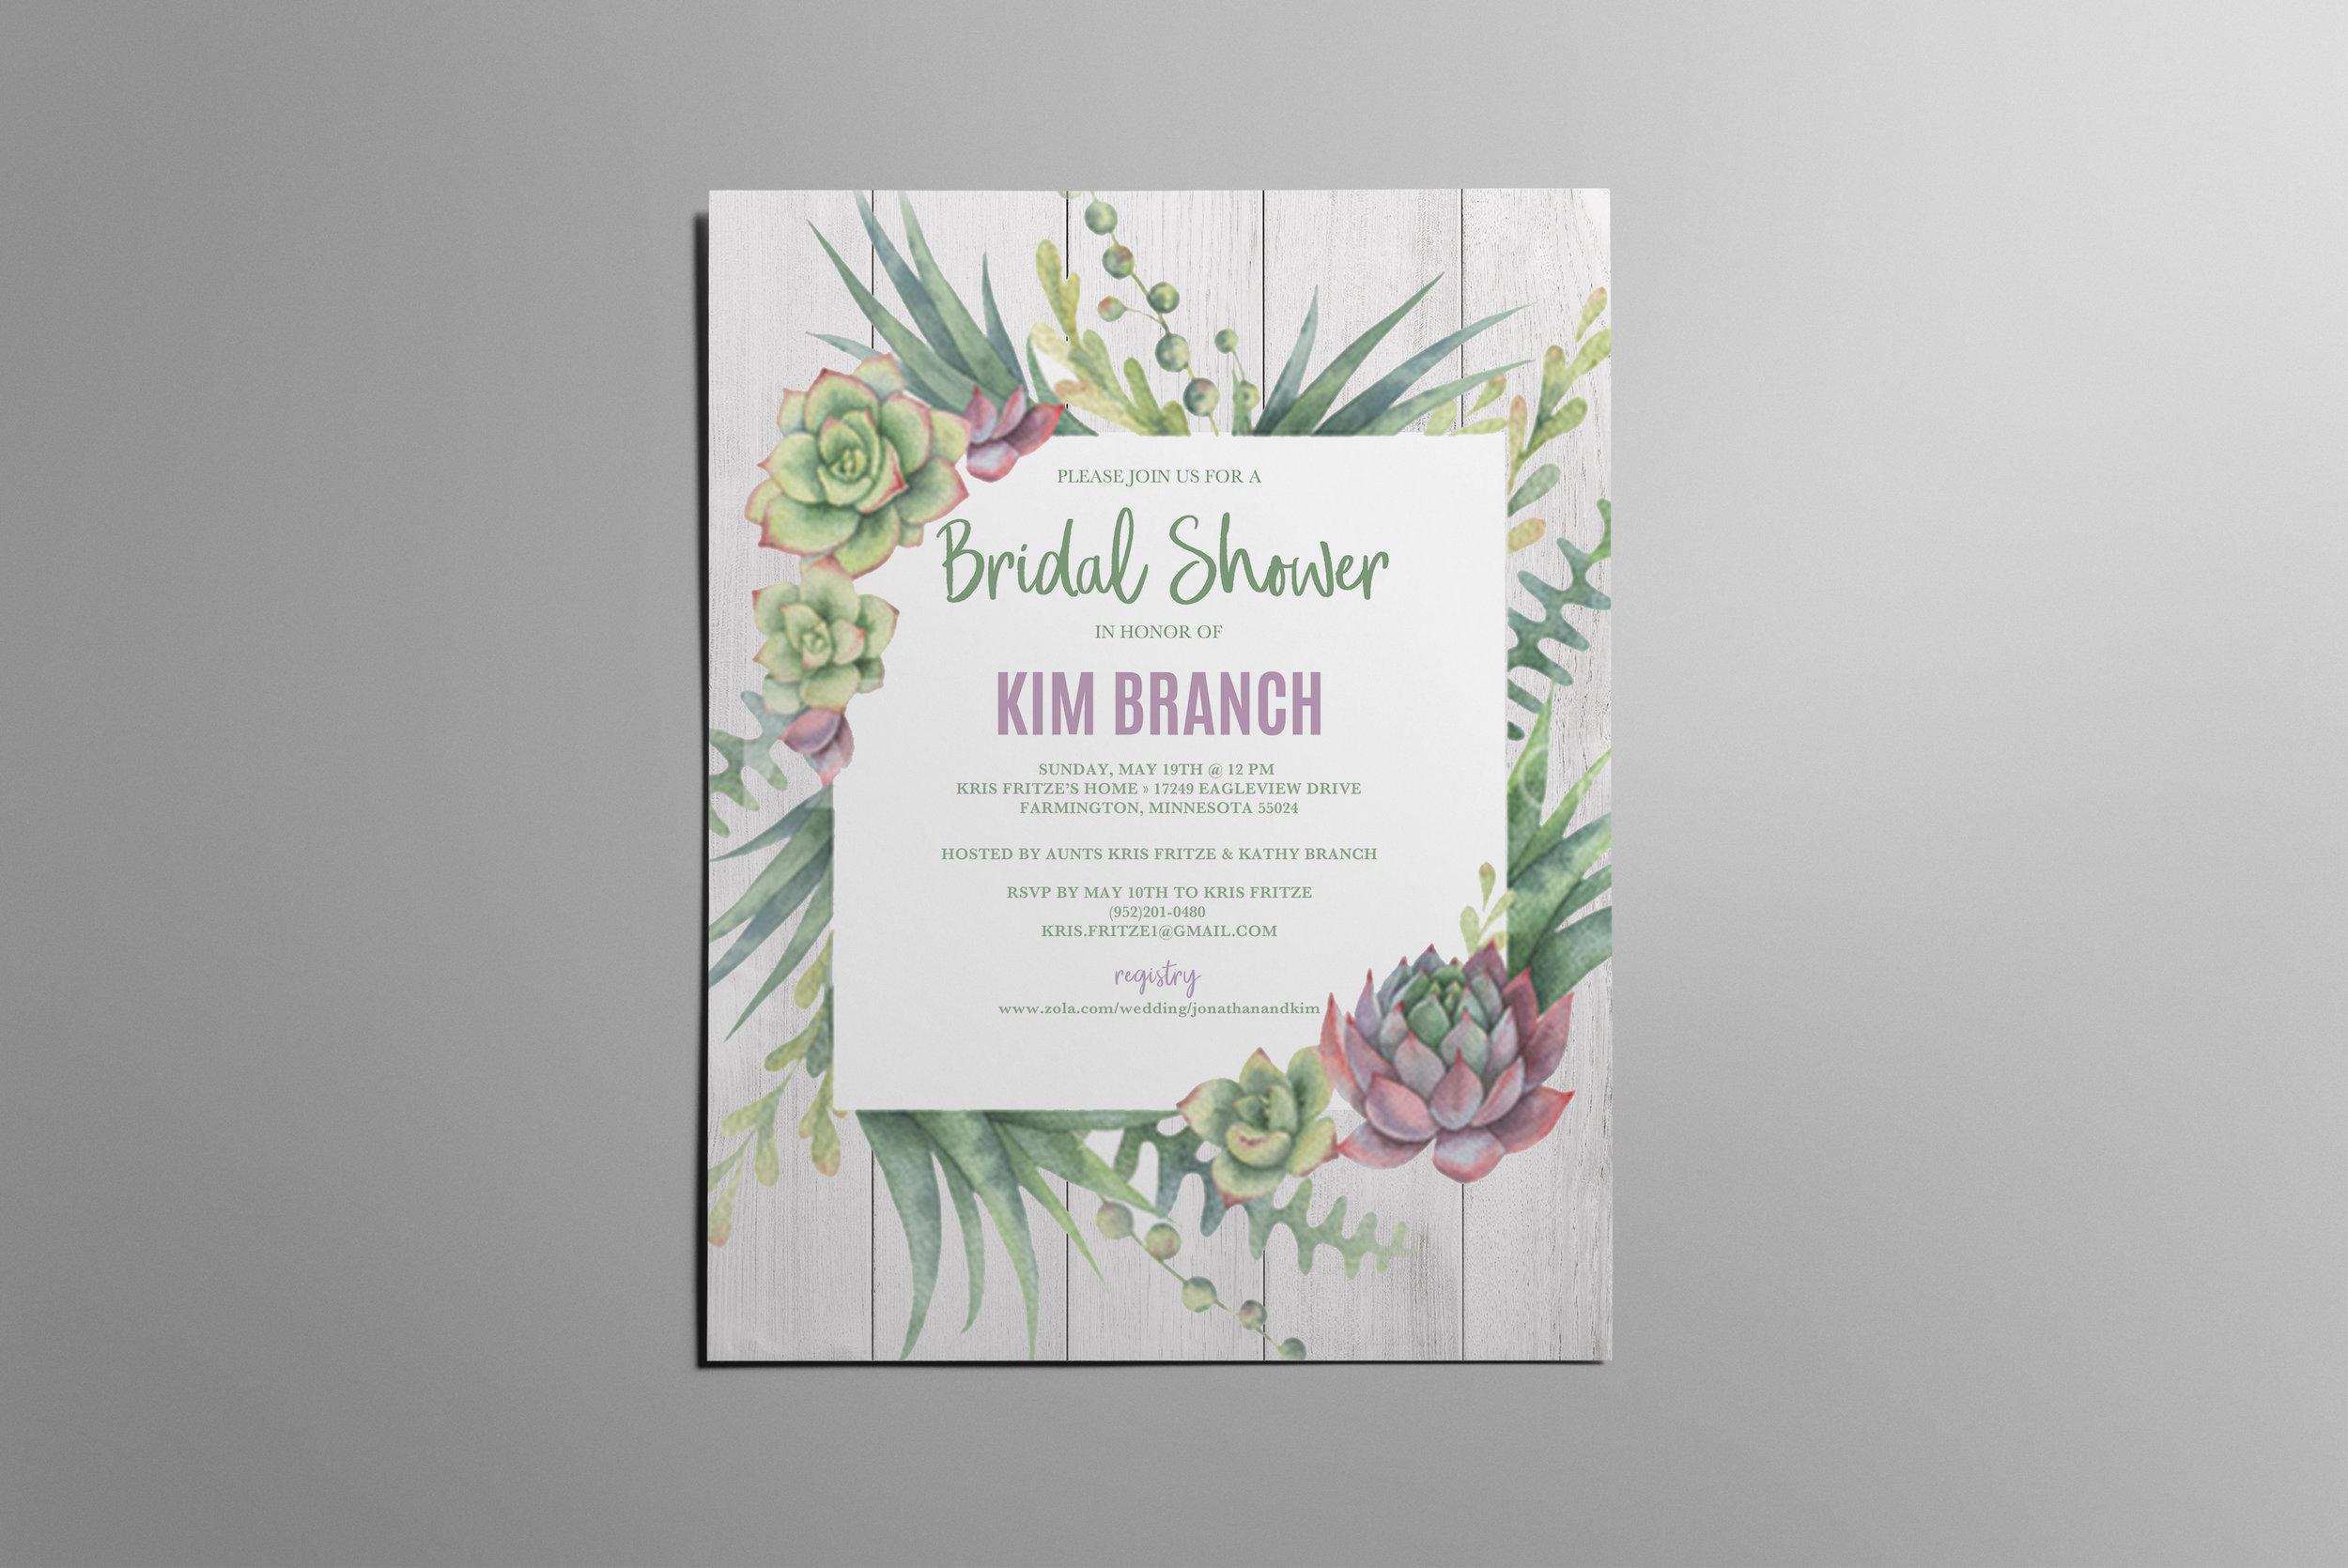 Bridal Shower Invite mockup.jpg